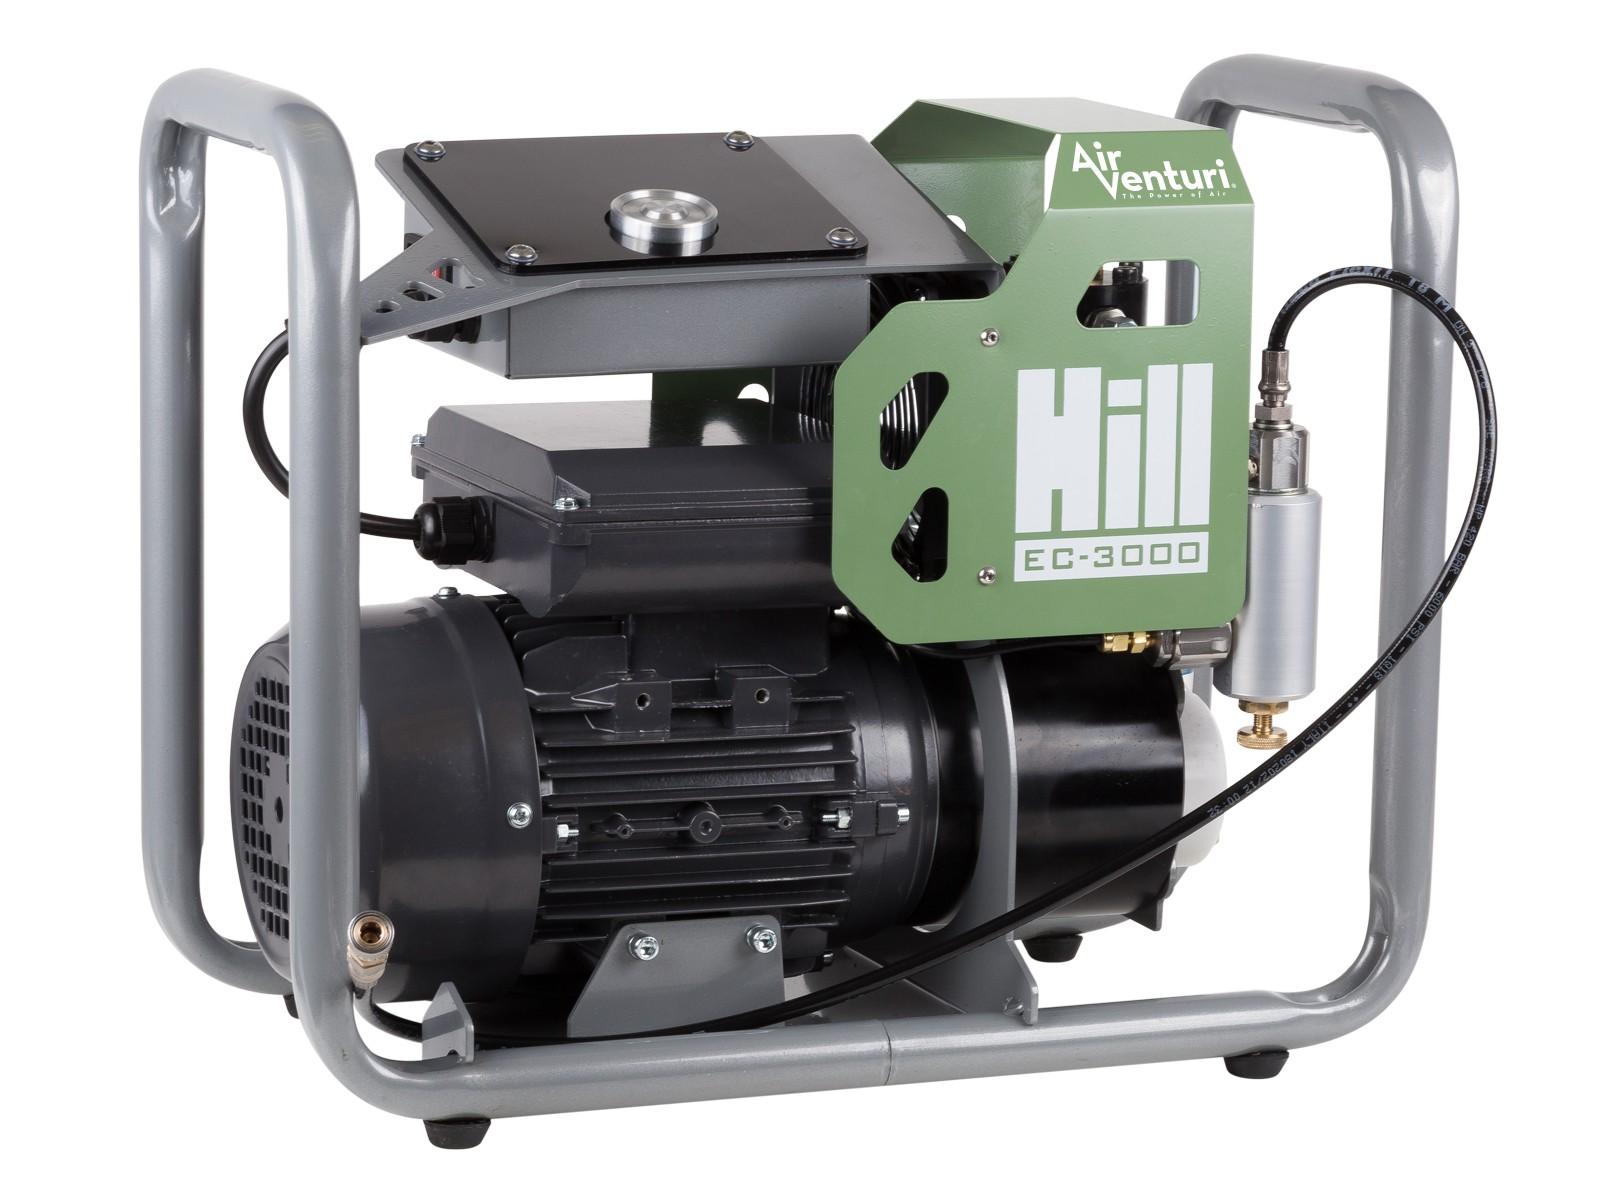 Air Venturi EC-3000 Compressor, 4350 PSI